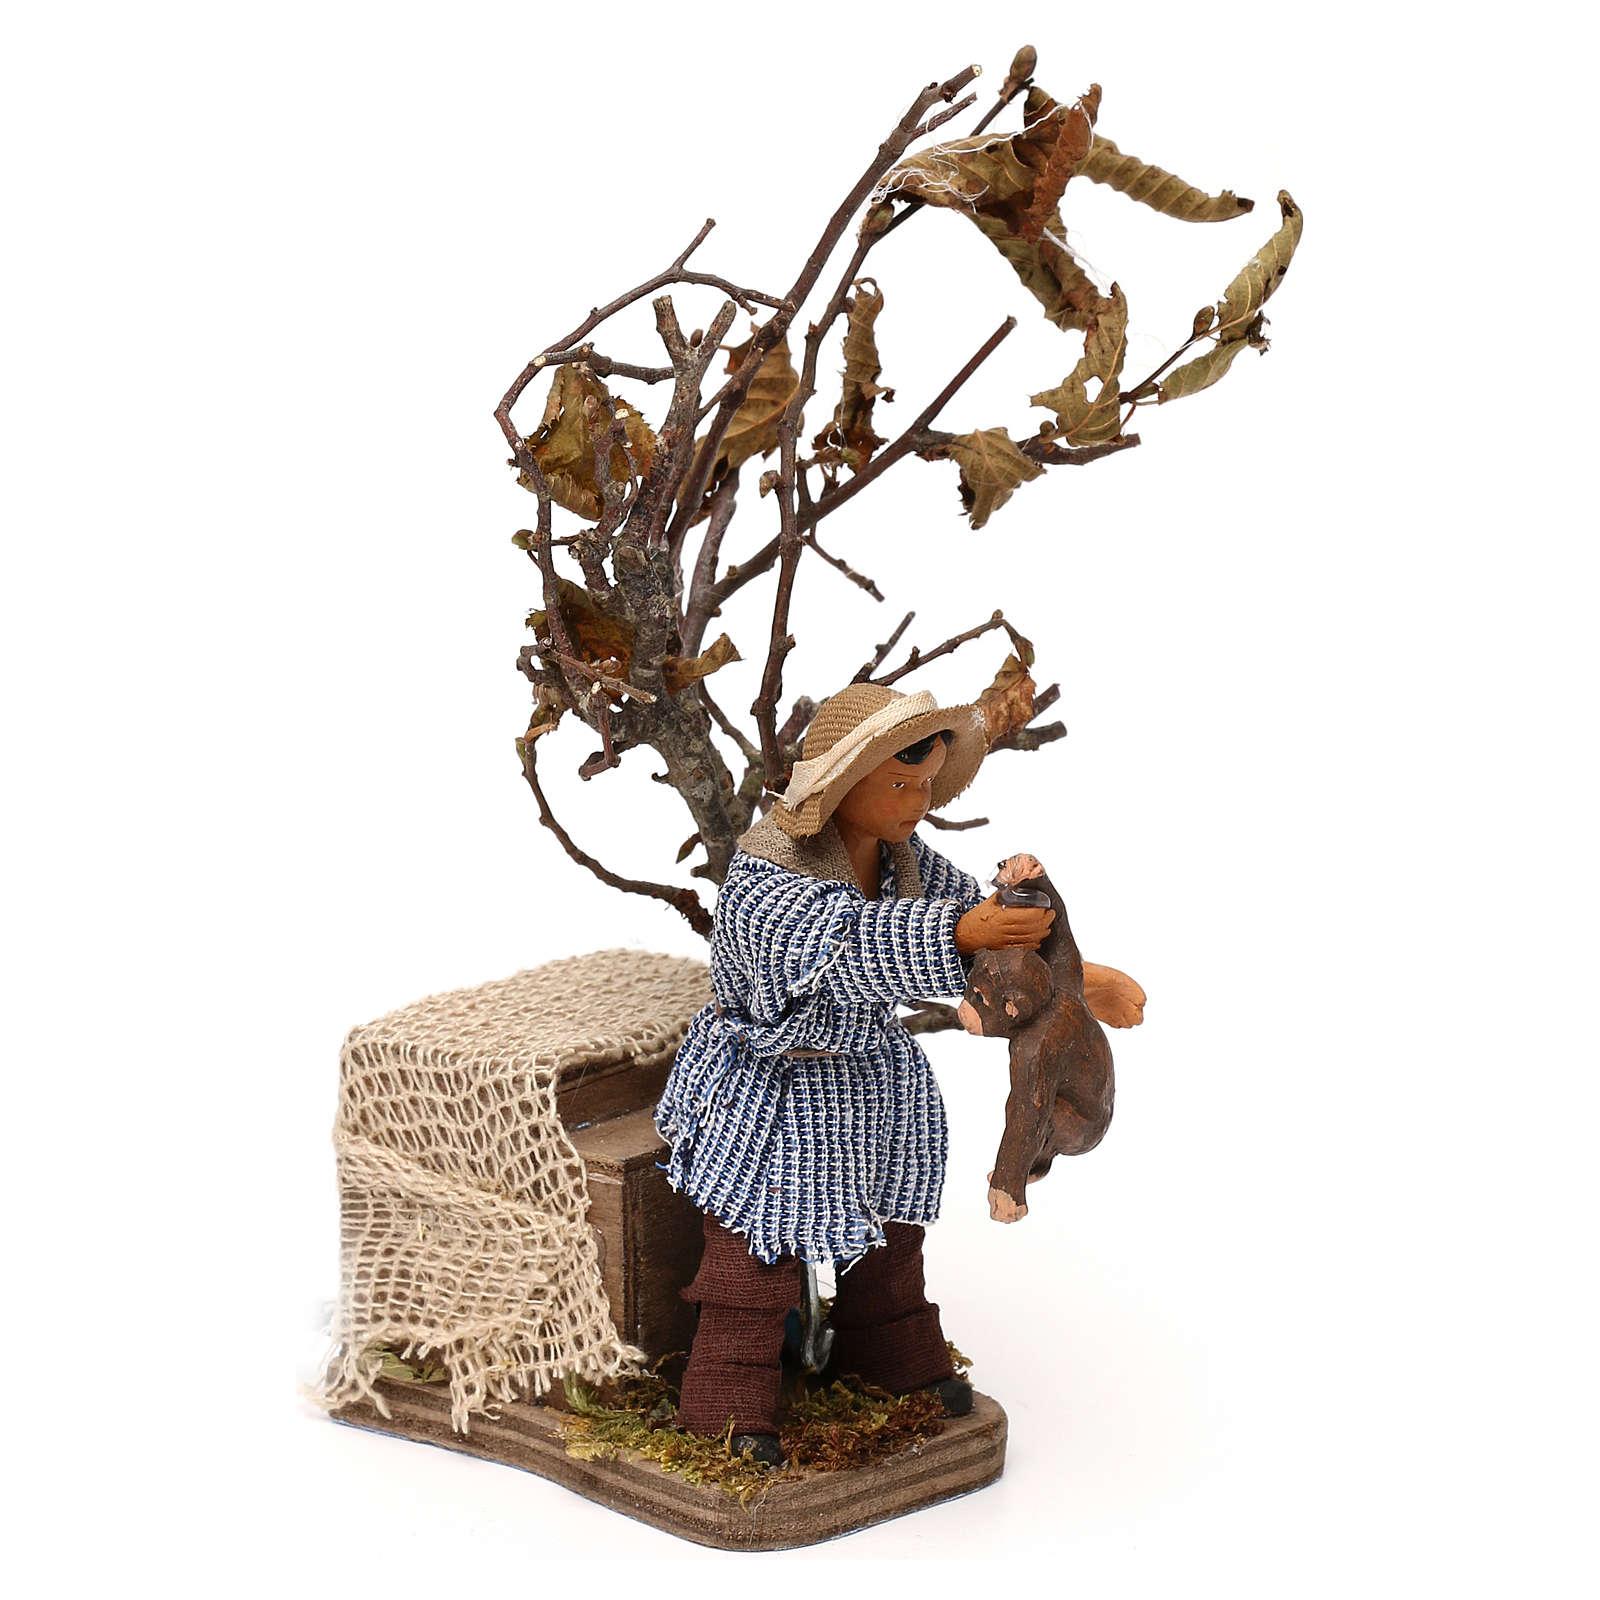 Young boy with monkey 12cm Neapolitan Nativity animated figurine 4